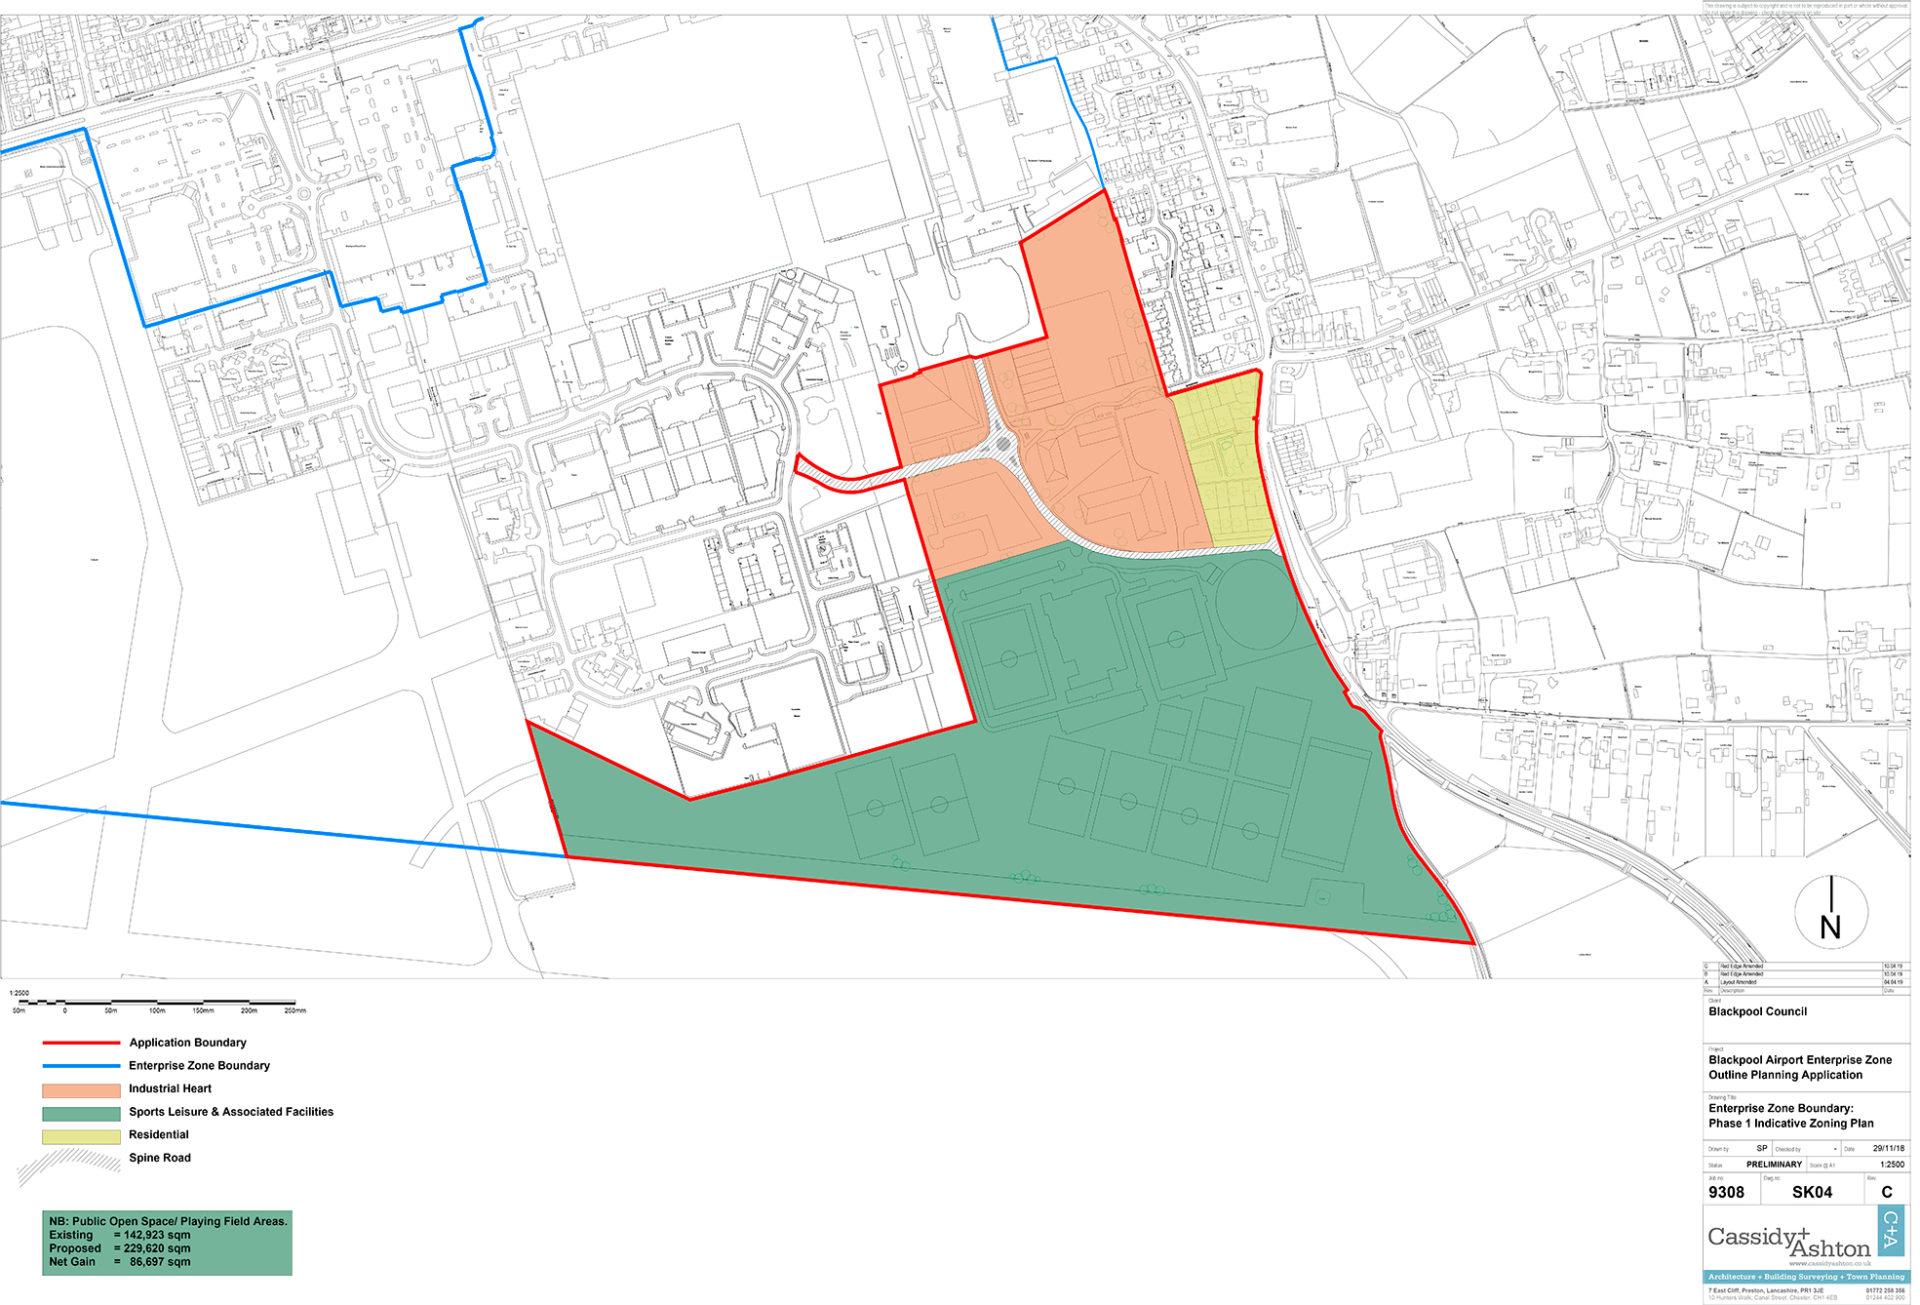 Blackpool Airport EZ plans